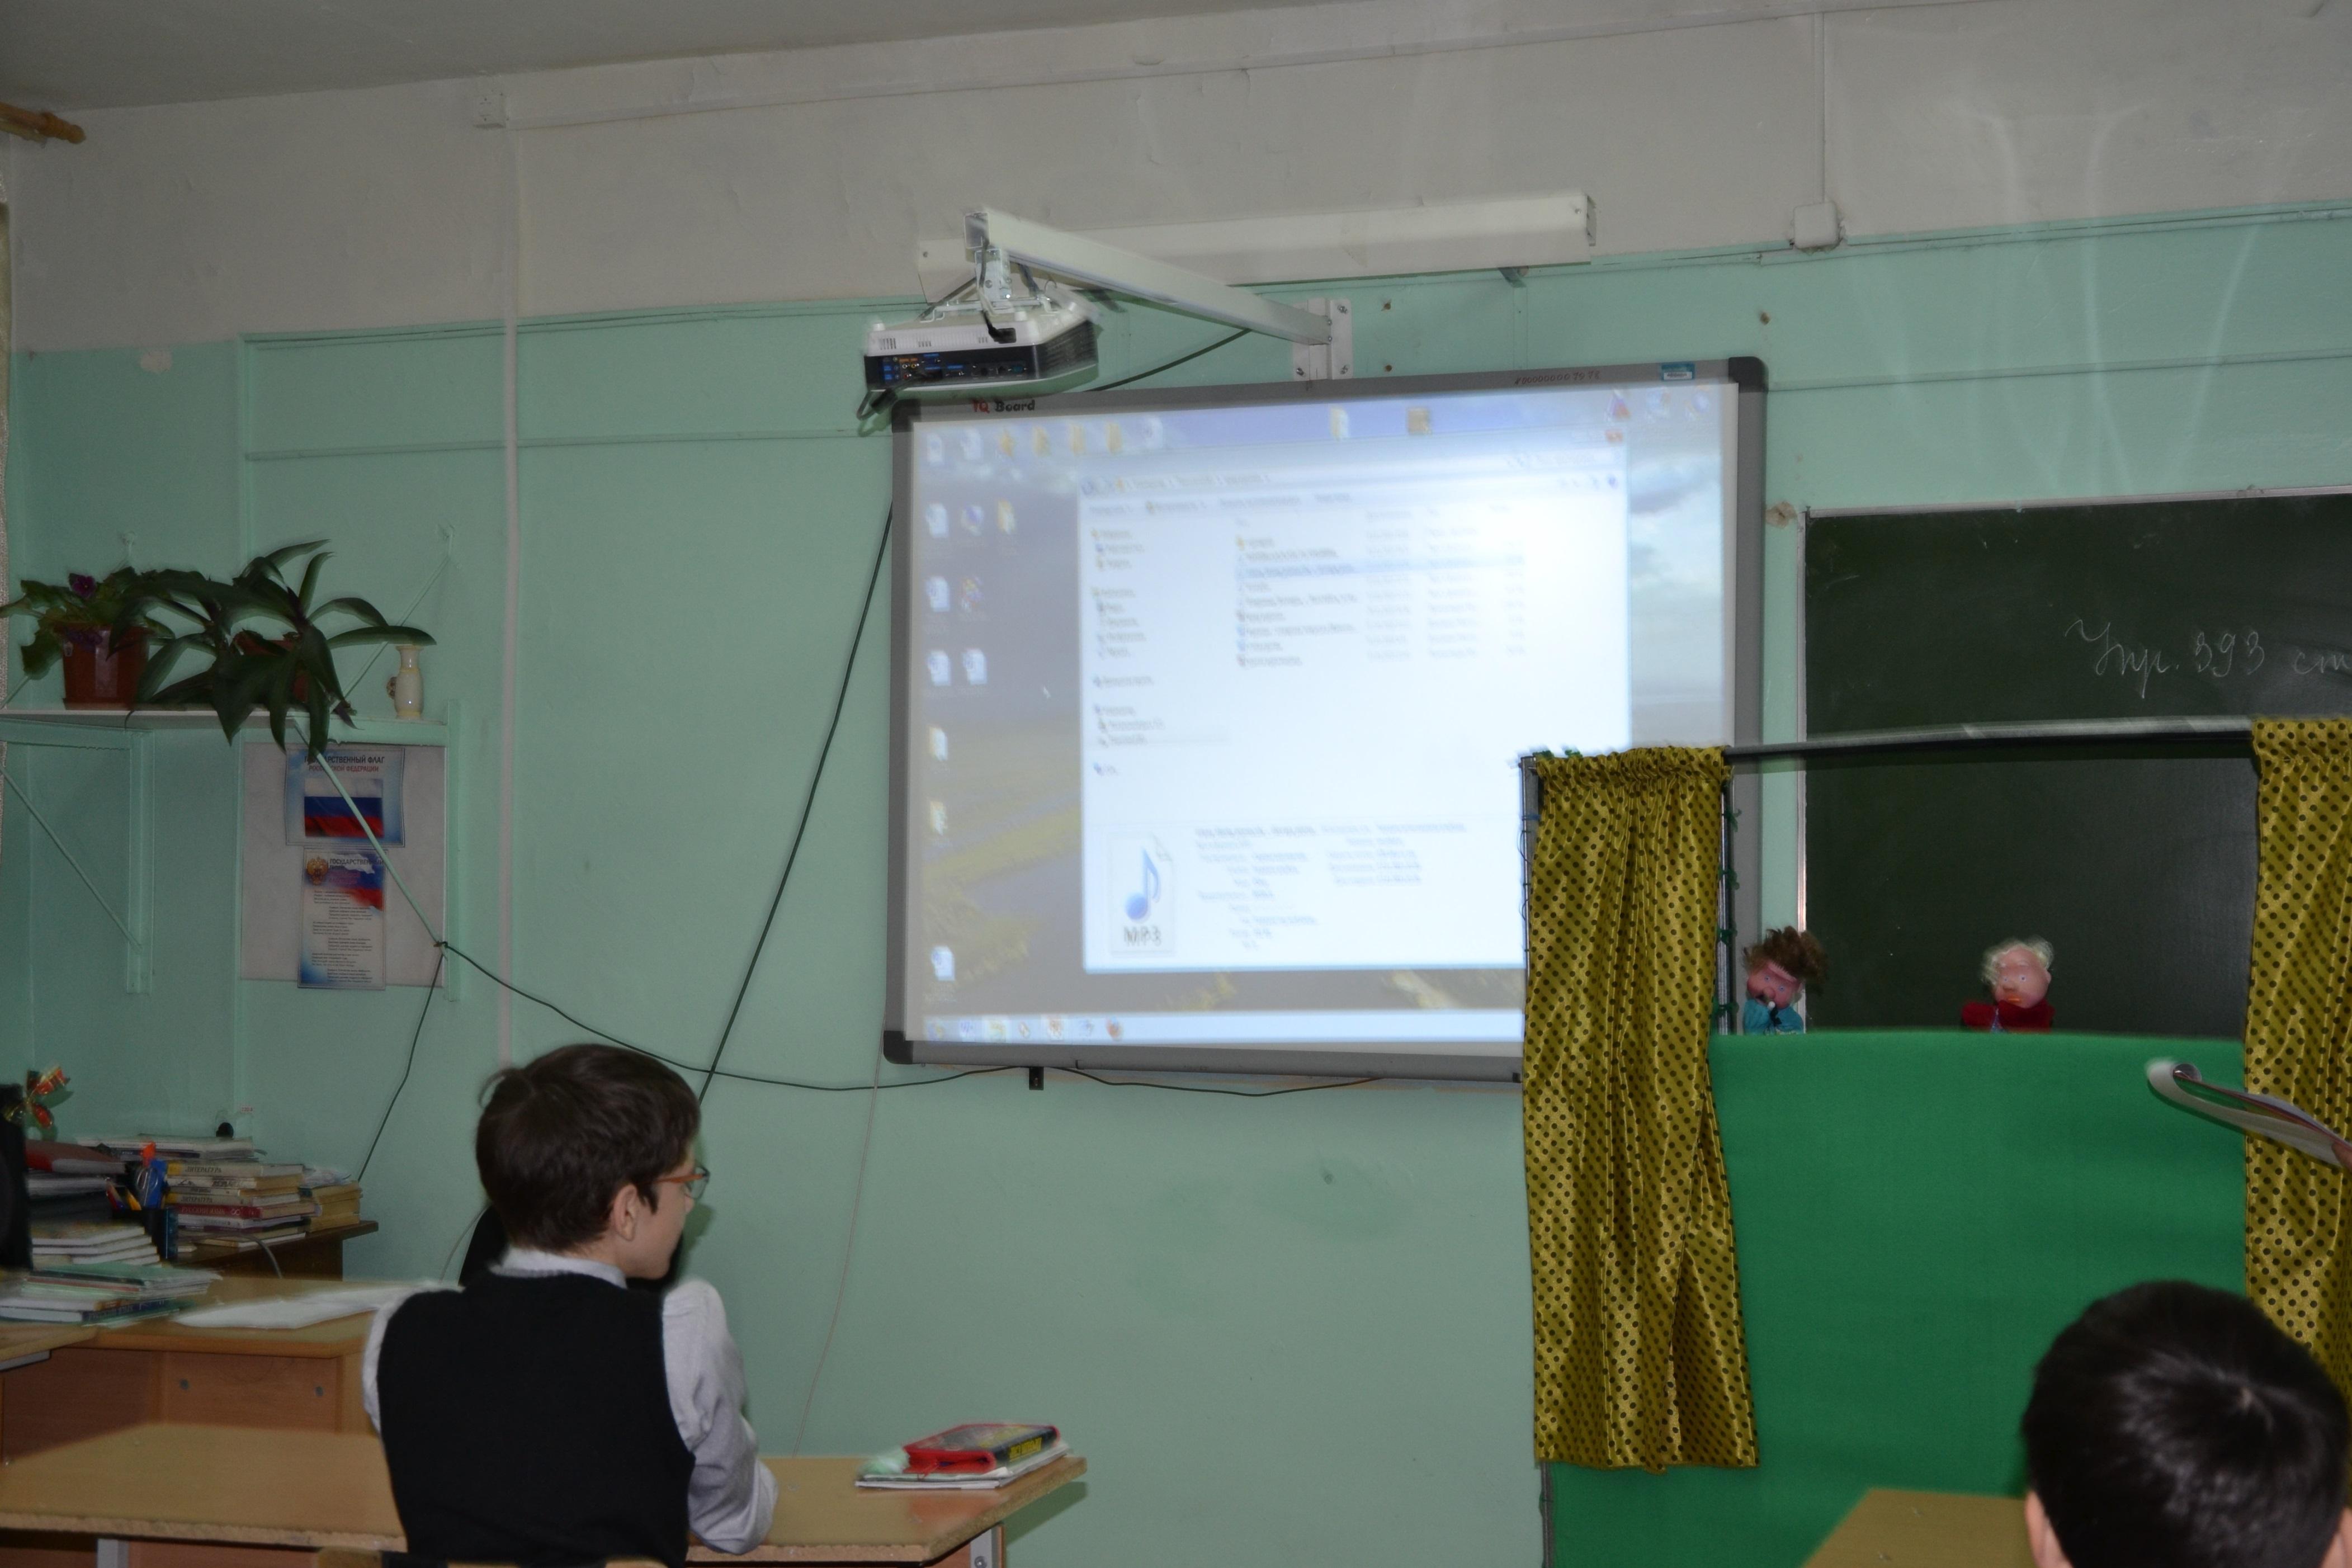 G:\фото\взаимодействие с\7 В класс 20.11.15\DSC_0091.JPG